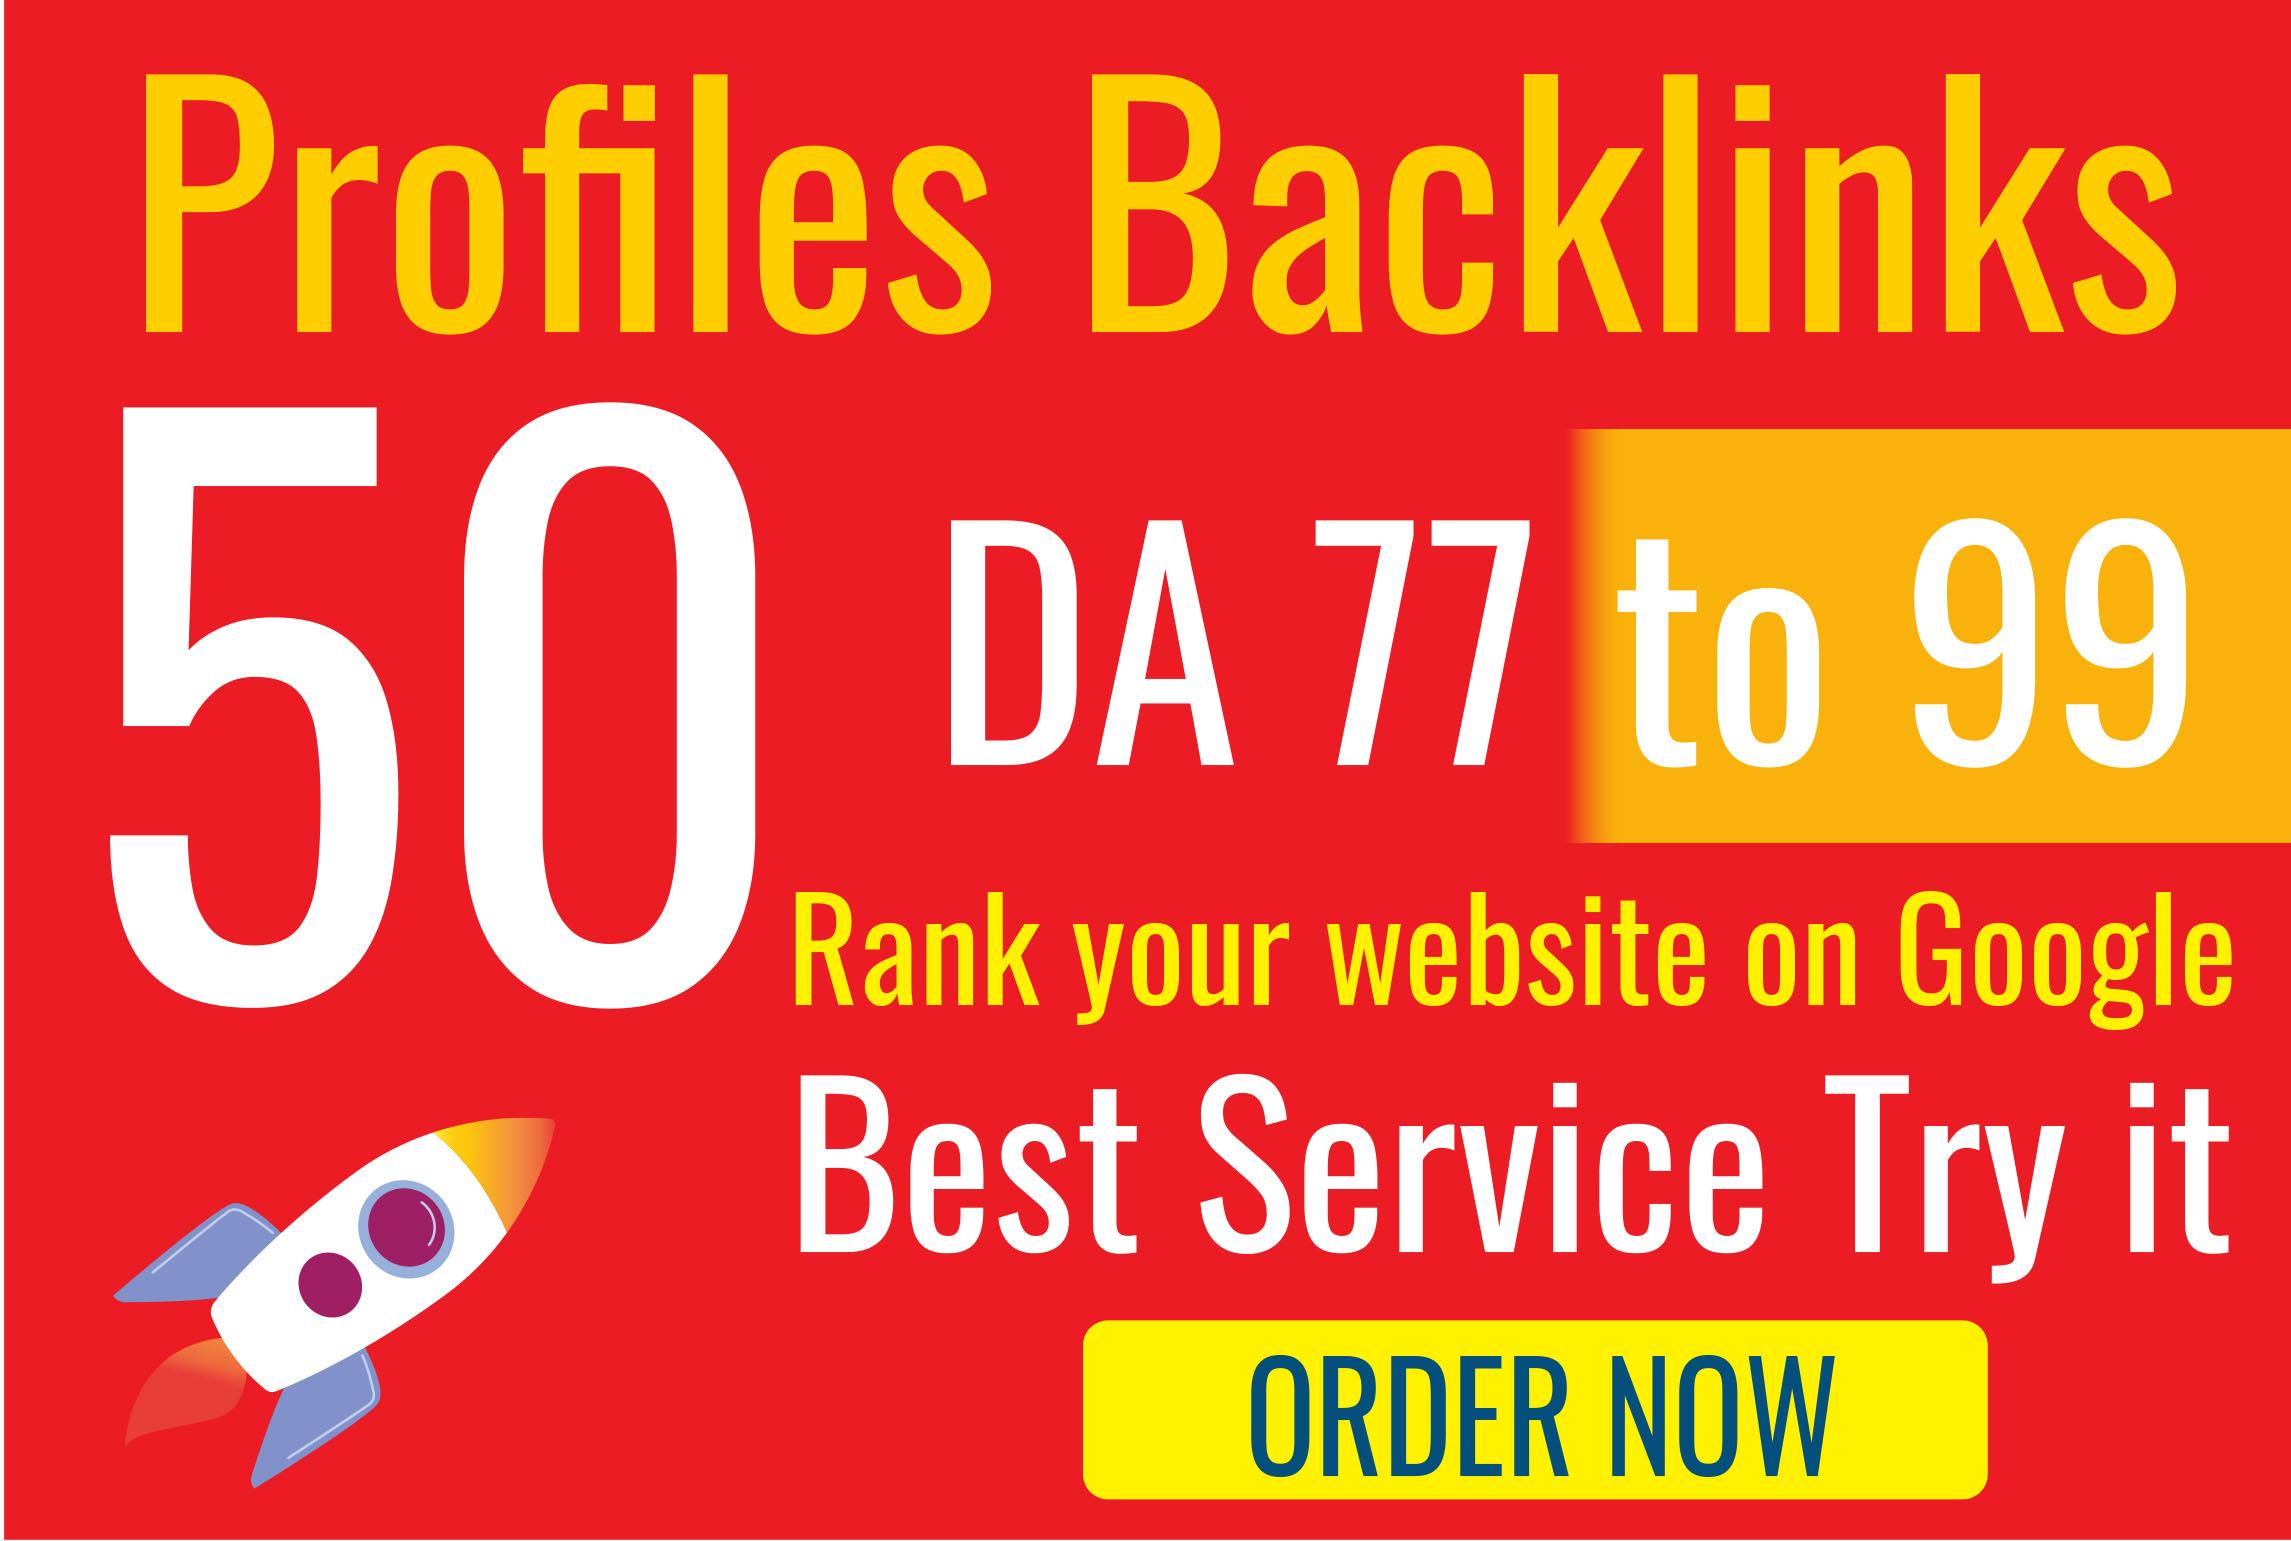 I'll make 50 manual backlinks on high authority websites linkbuilding SEO and get free backlinks